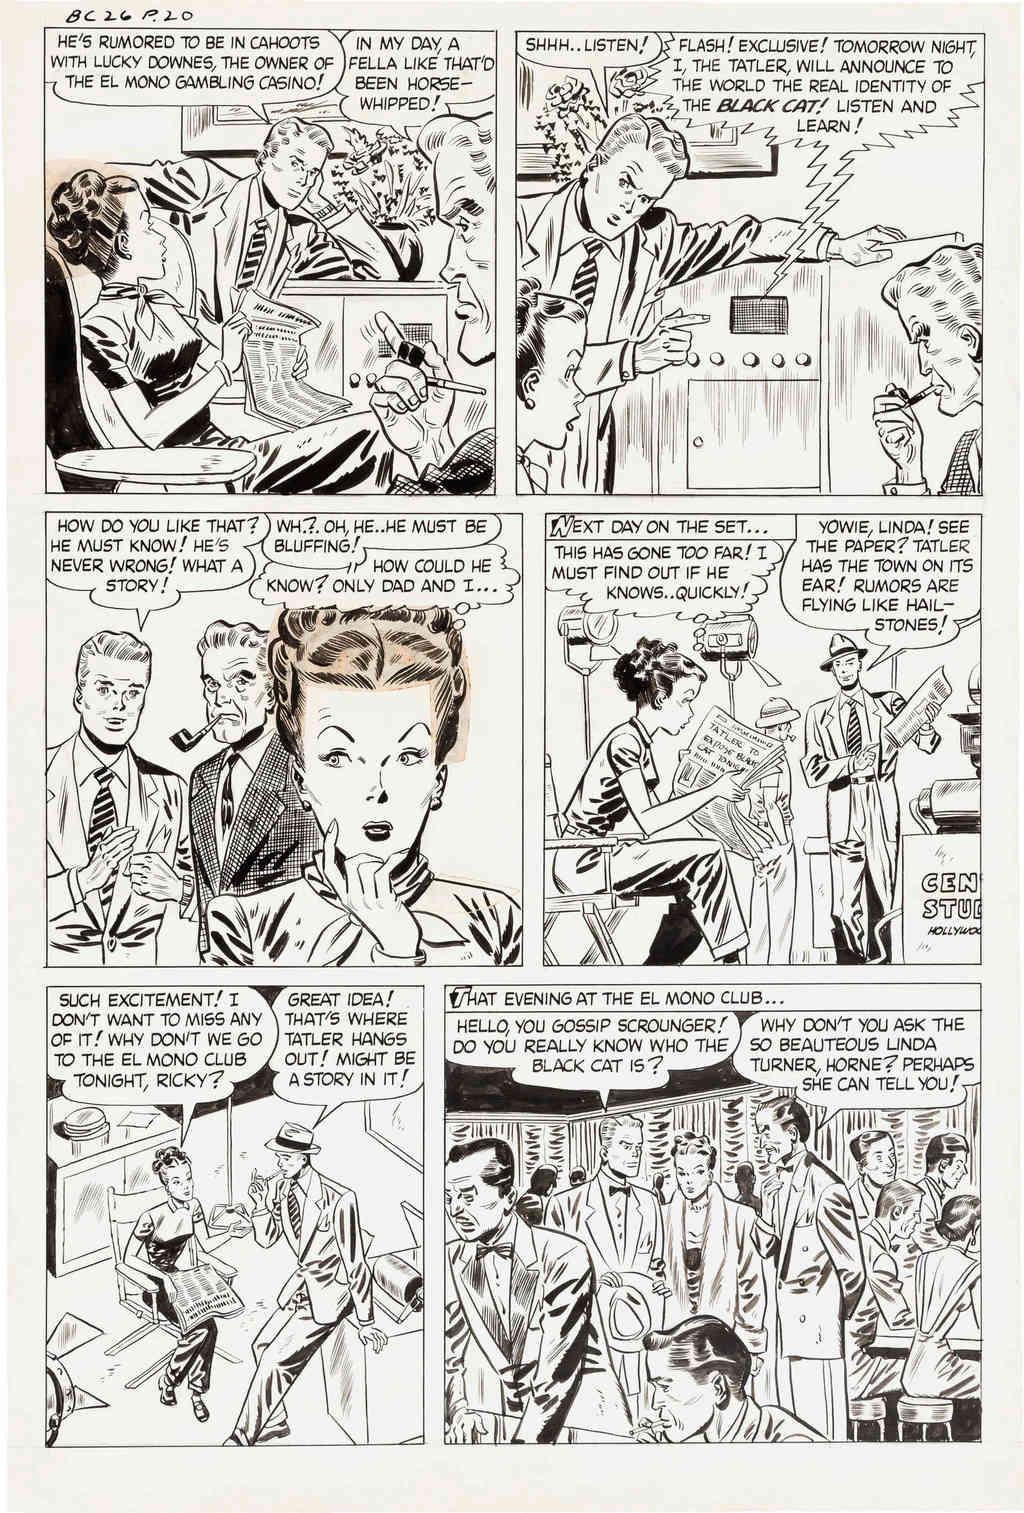 Cases méconnues - Page 12 Lee_el10